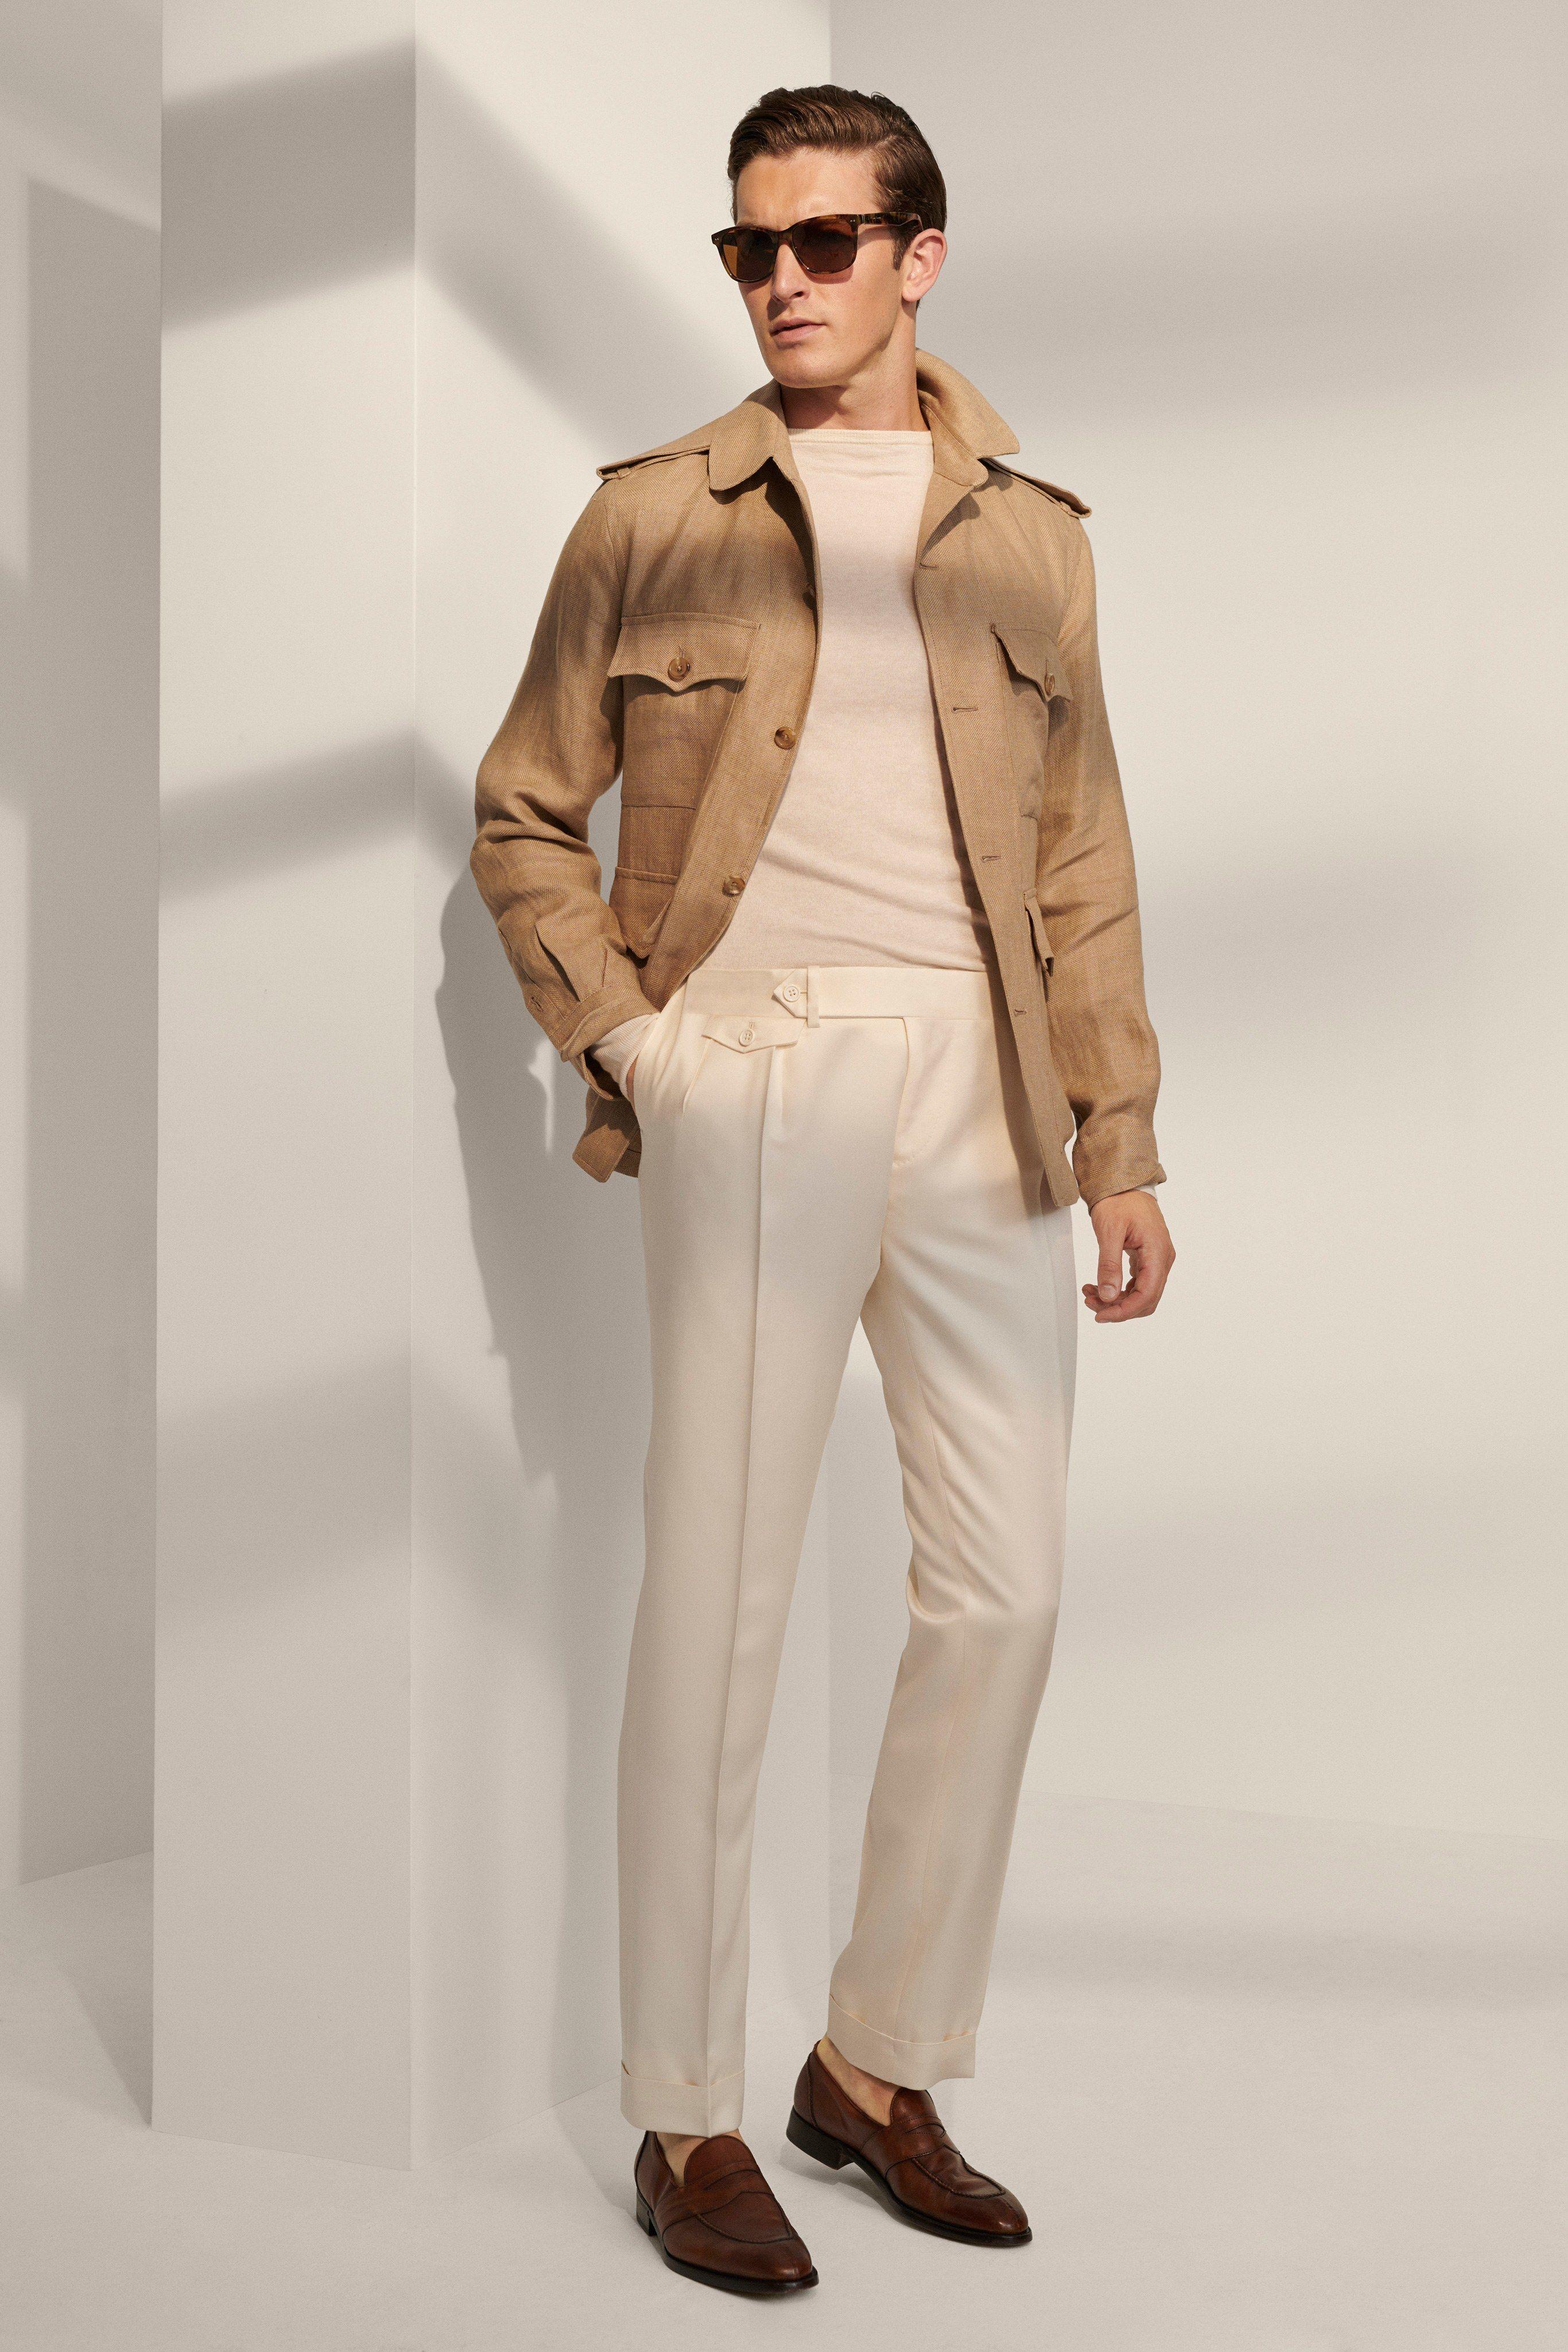 Ralph Lauren Spring 2020 Menswear Fashion Show Ralph Lauren Menswear Menswear Mens Outfits